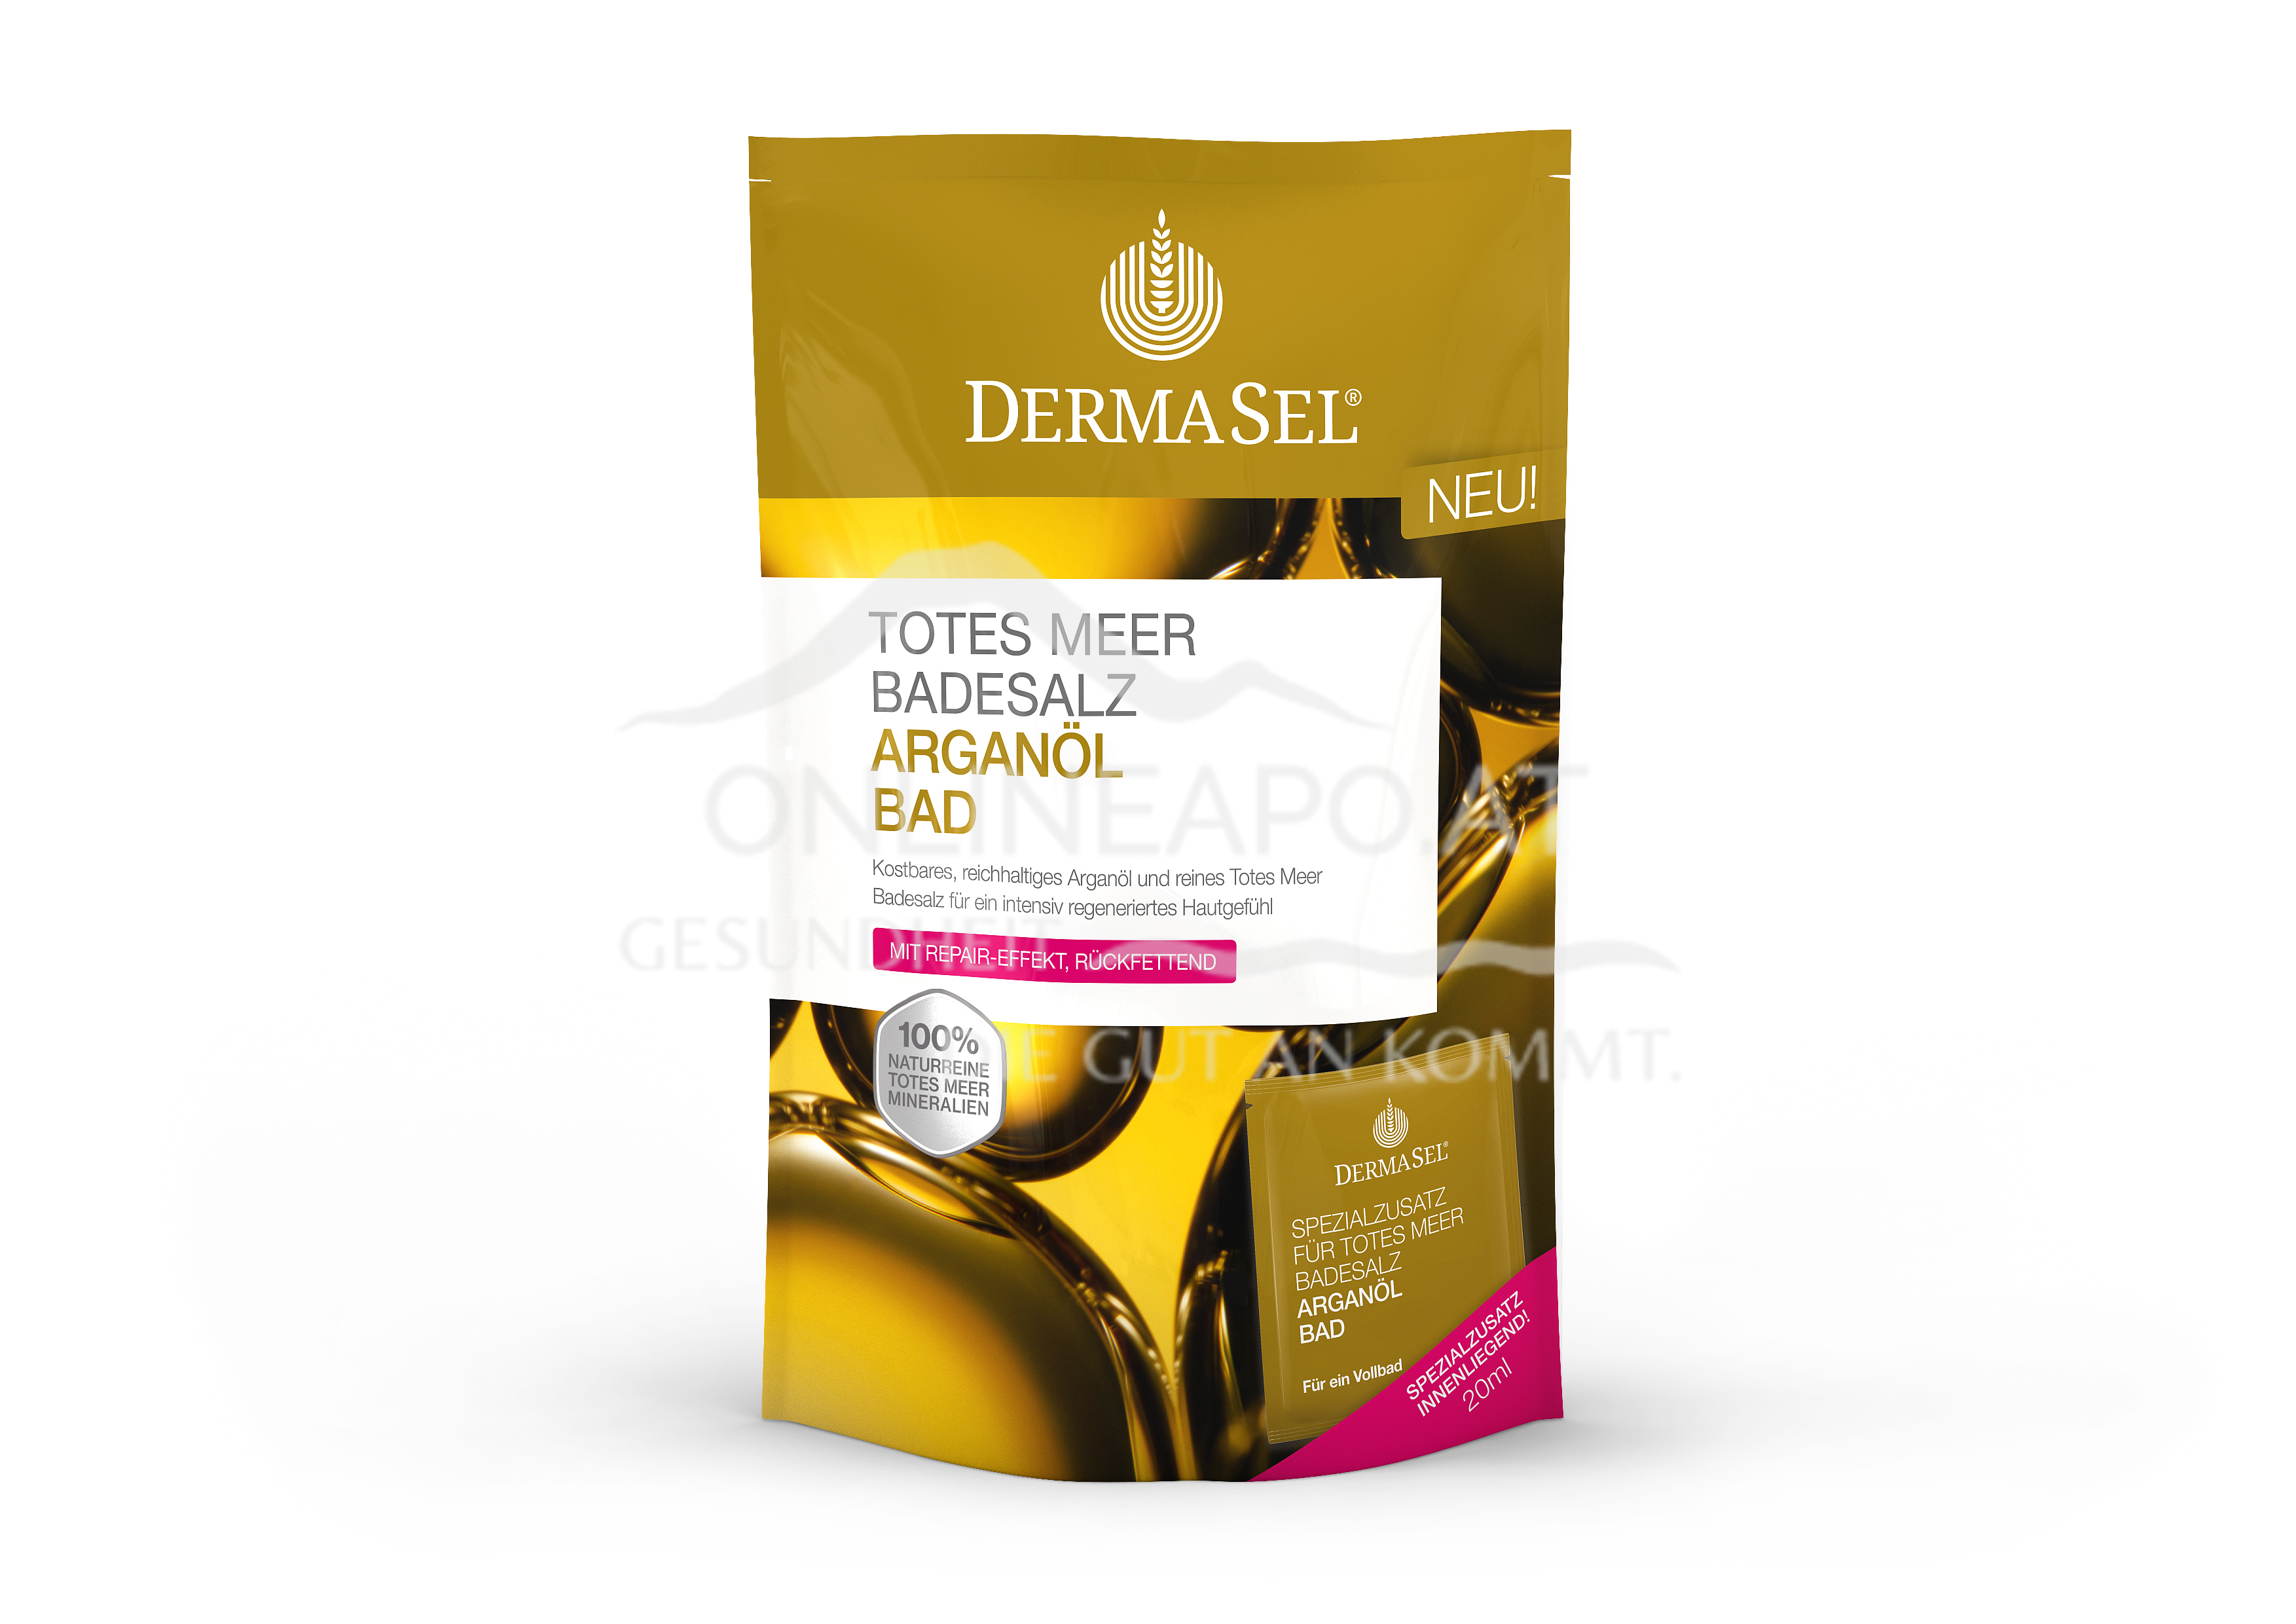 DermaSel® Totes Meer Badesalz Arganöl Bad